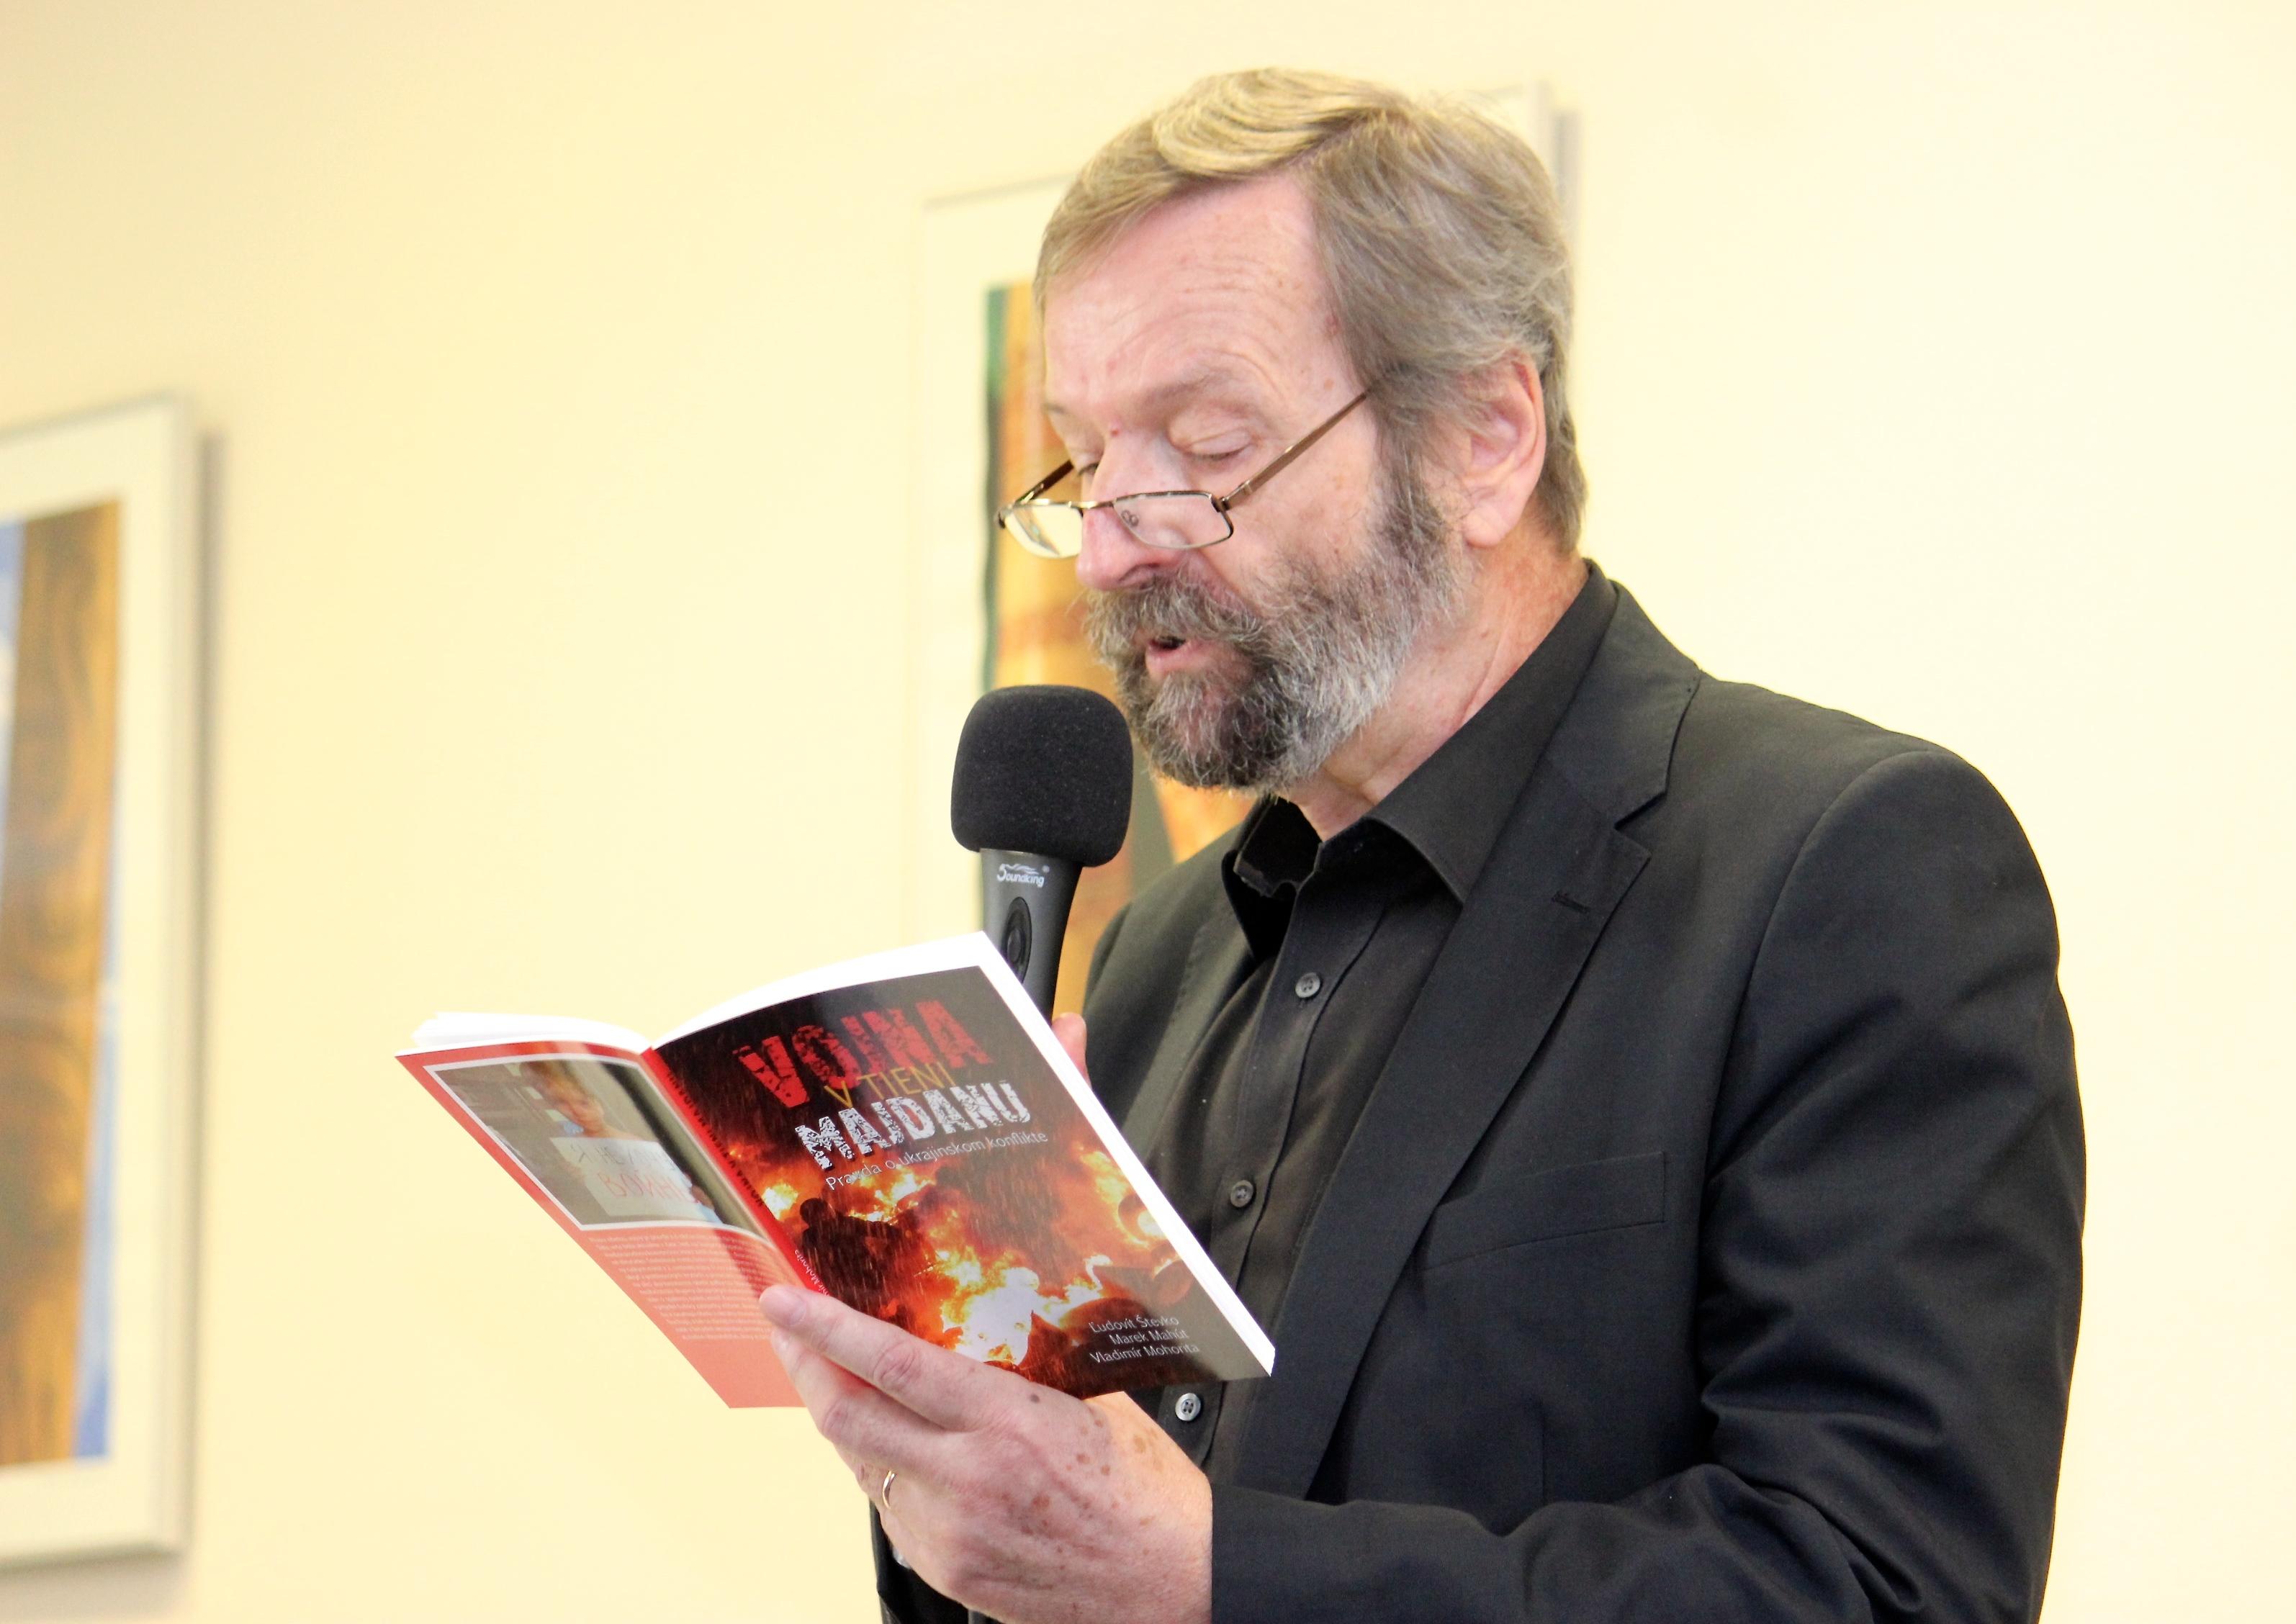 Úryvky z knižky čítal na prezentácii herec Jozef Šimonovič. (Foto: Michaela Kolimárová)